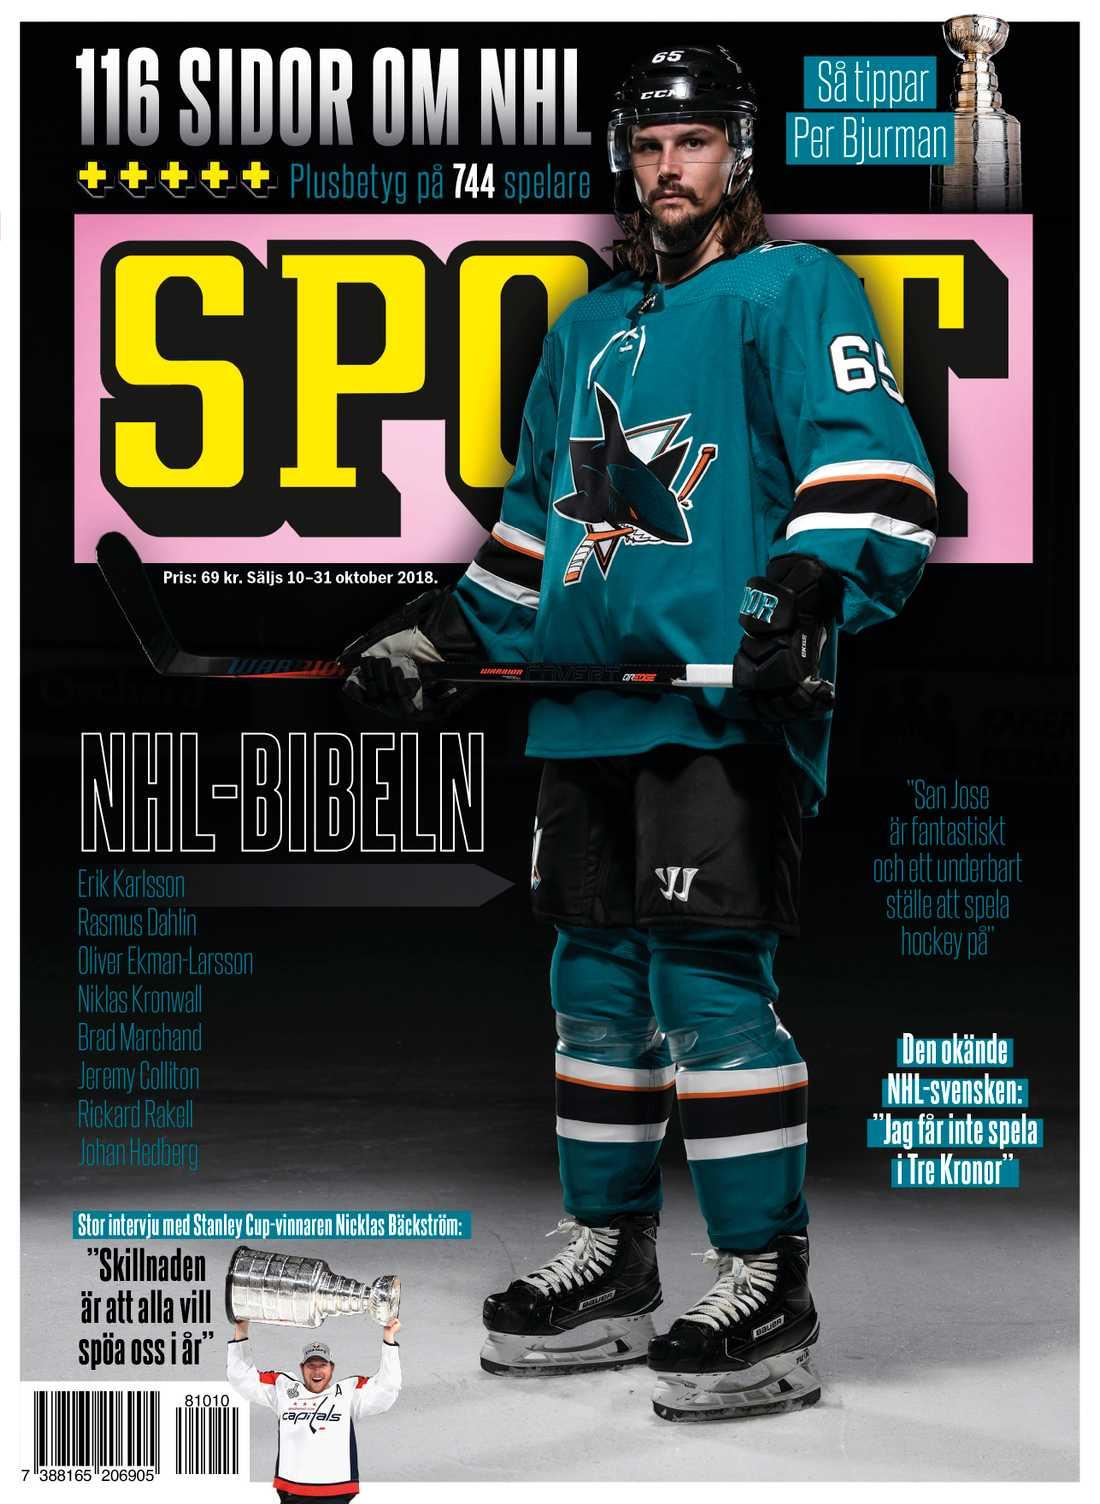 NHL-bibeln säljs i butik 10–31 oktober 2018.